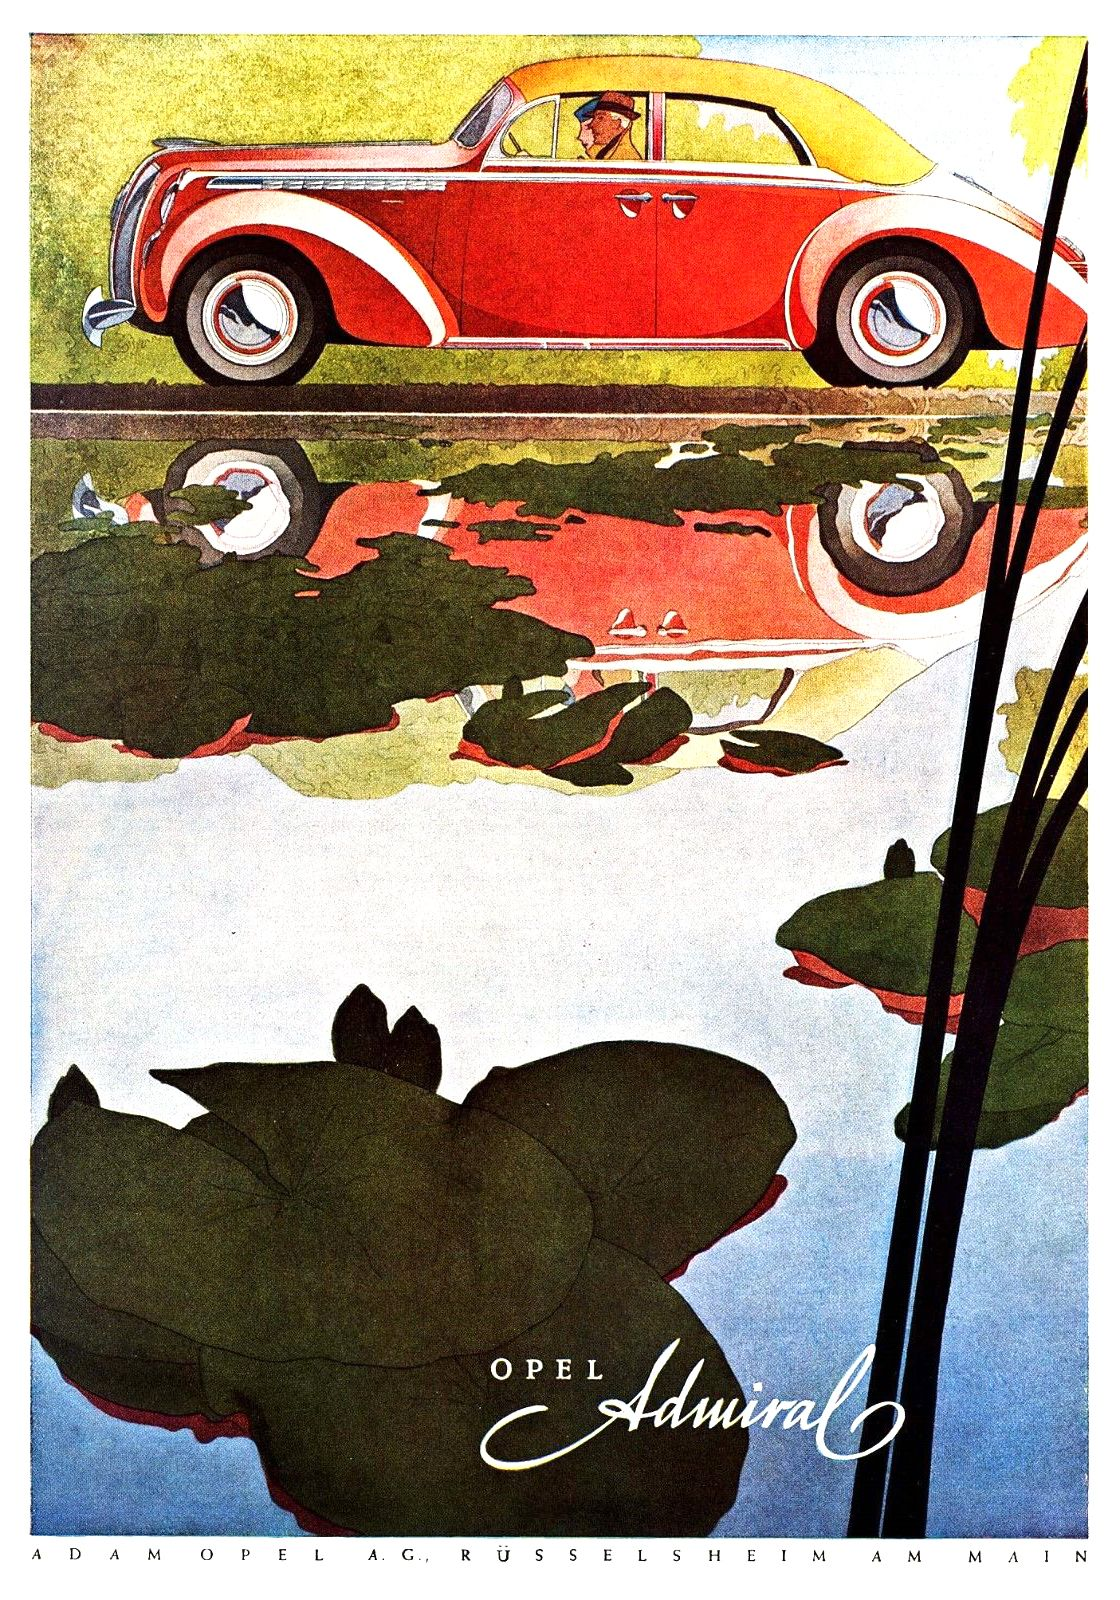 Fb Opel Admiral 1939 Advertising Art By Bernd Reuters Ad Art Opel Art